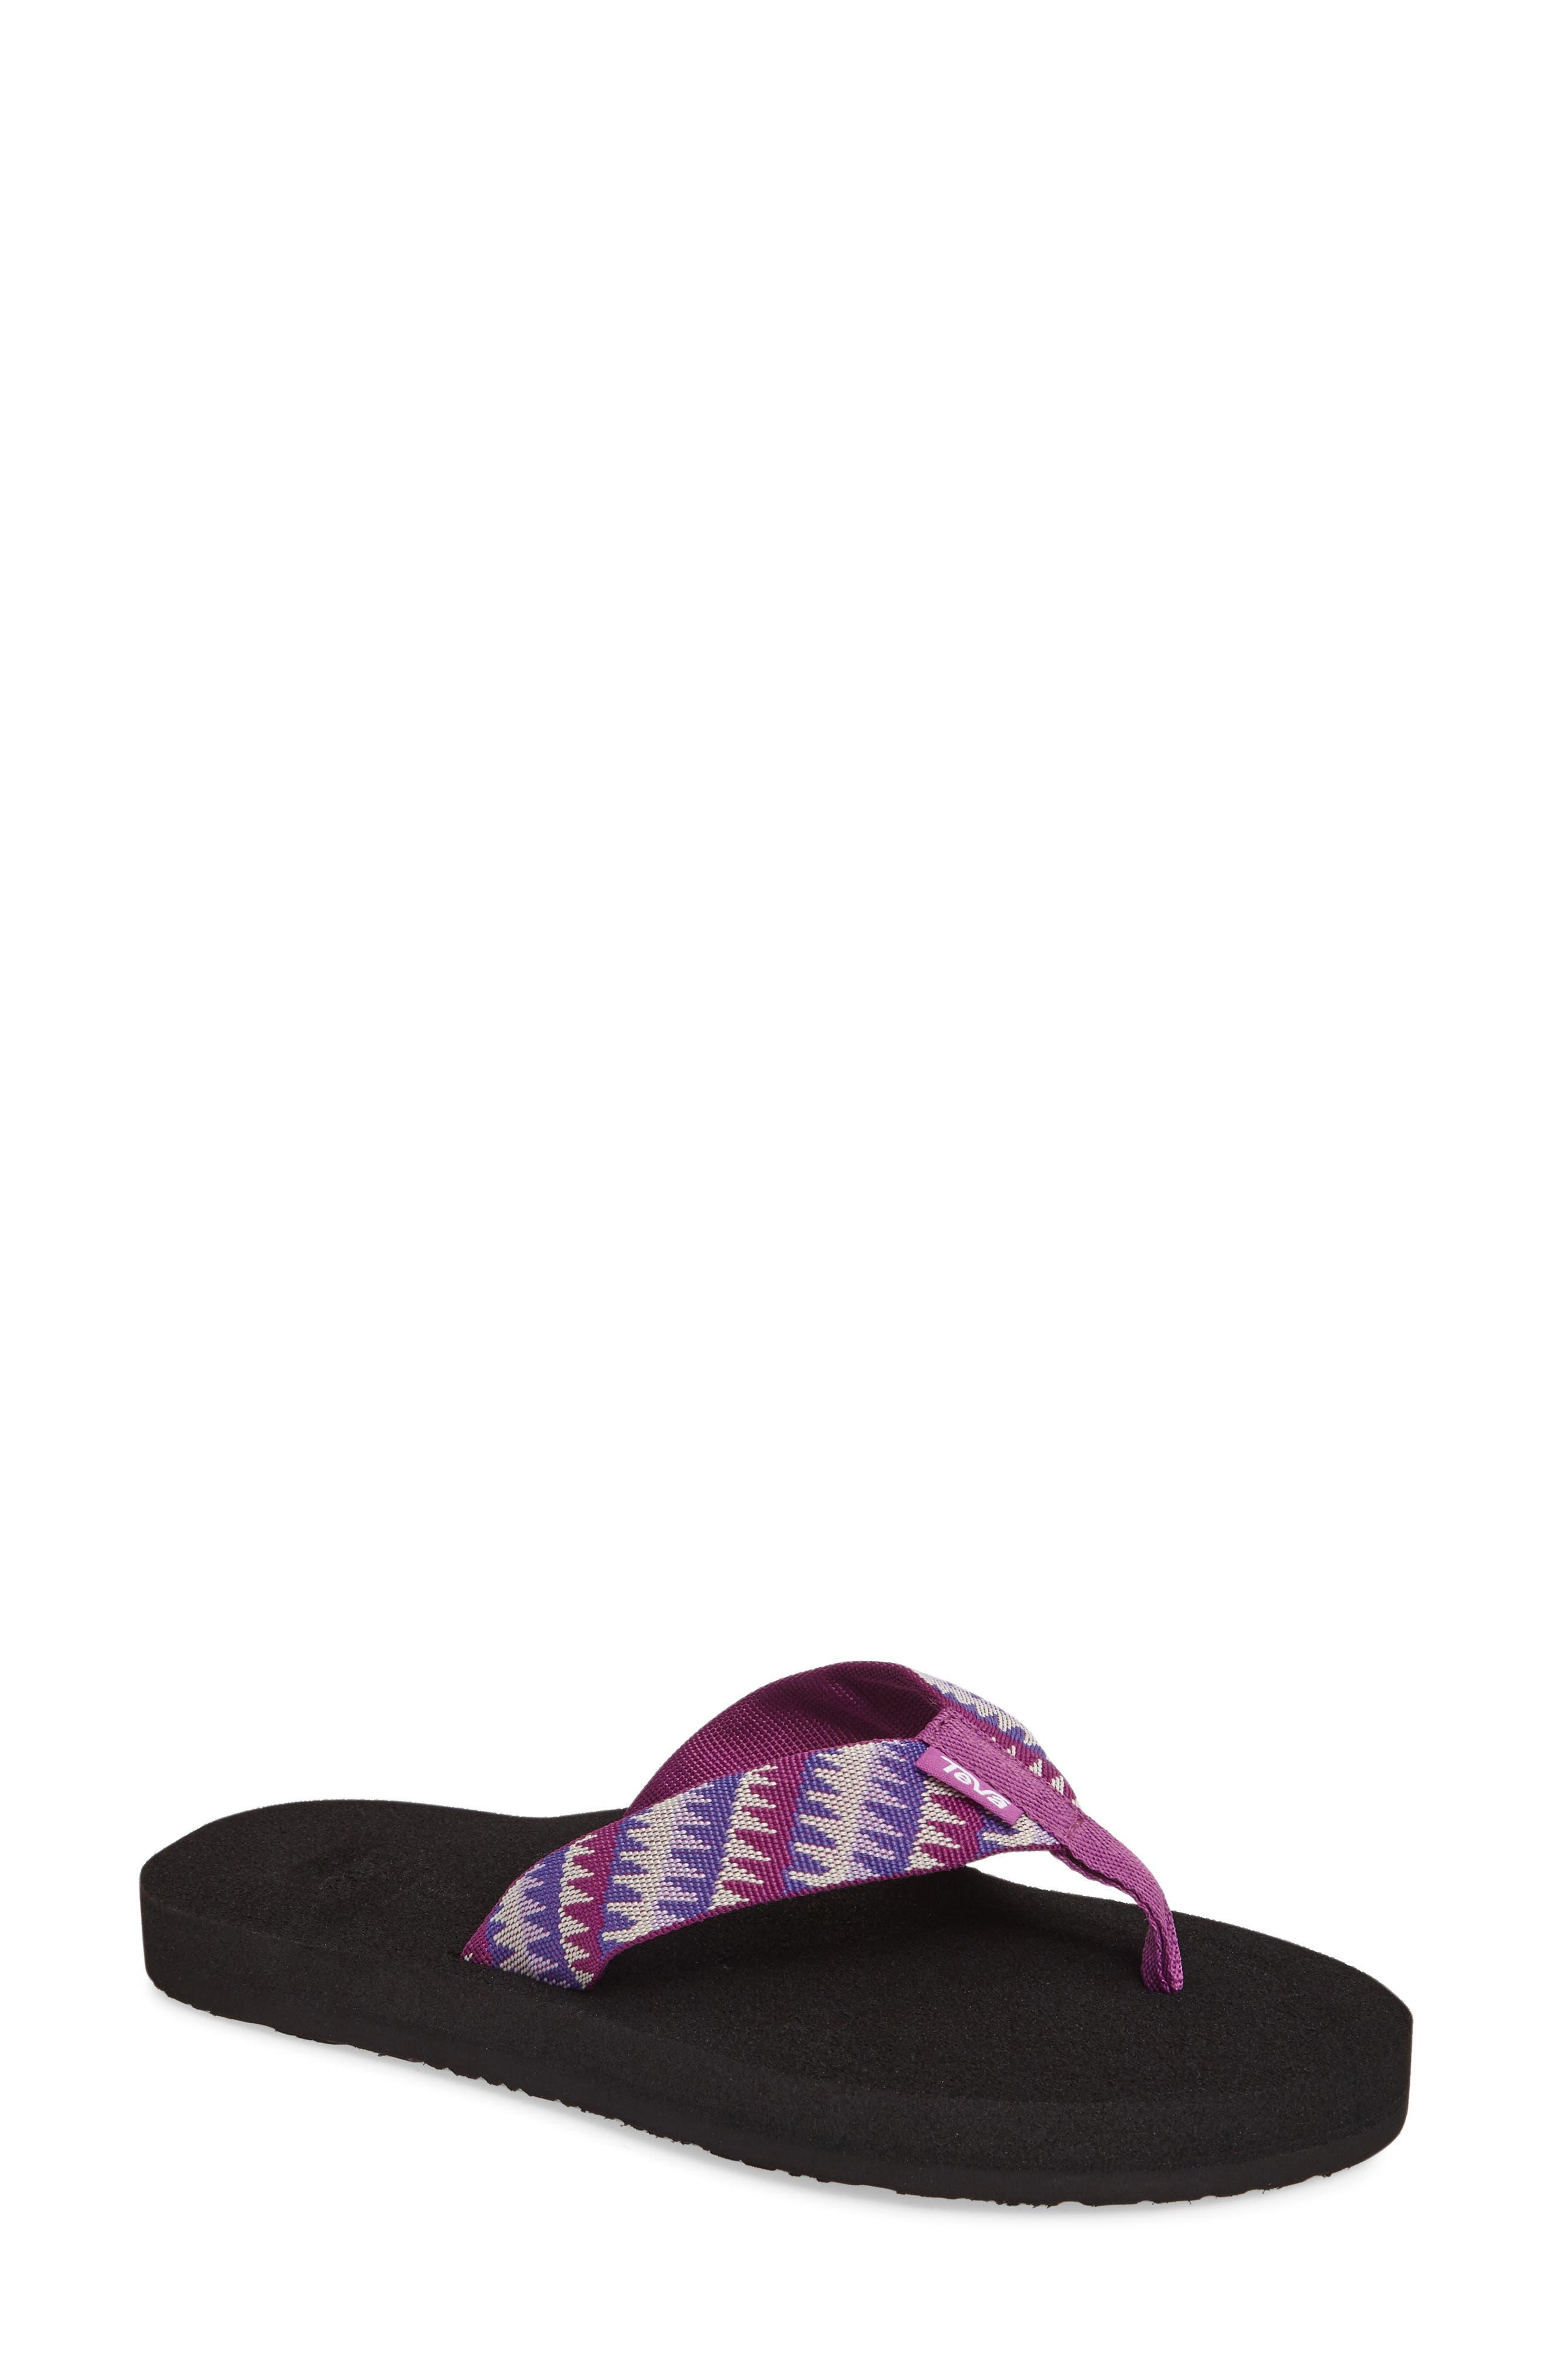 Main Image - Teva Mush II Flip Flop (Women)